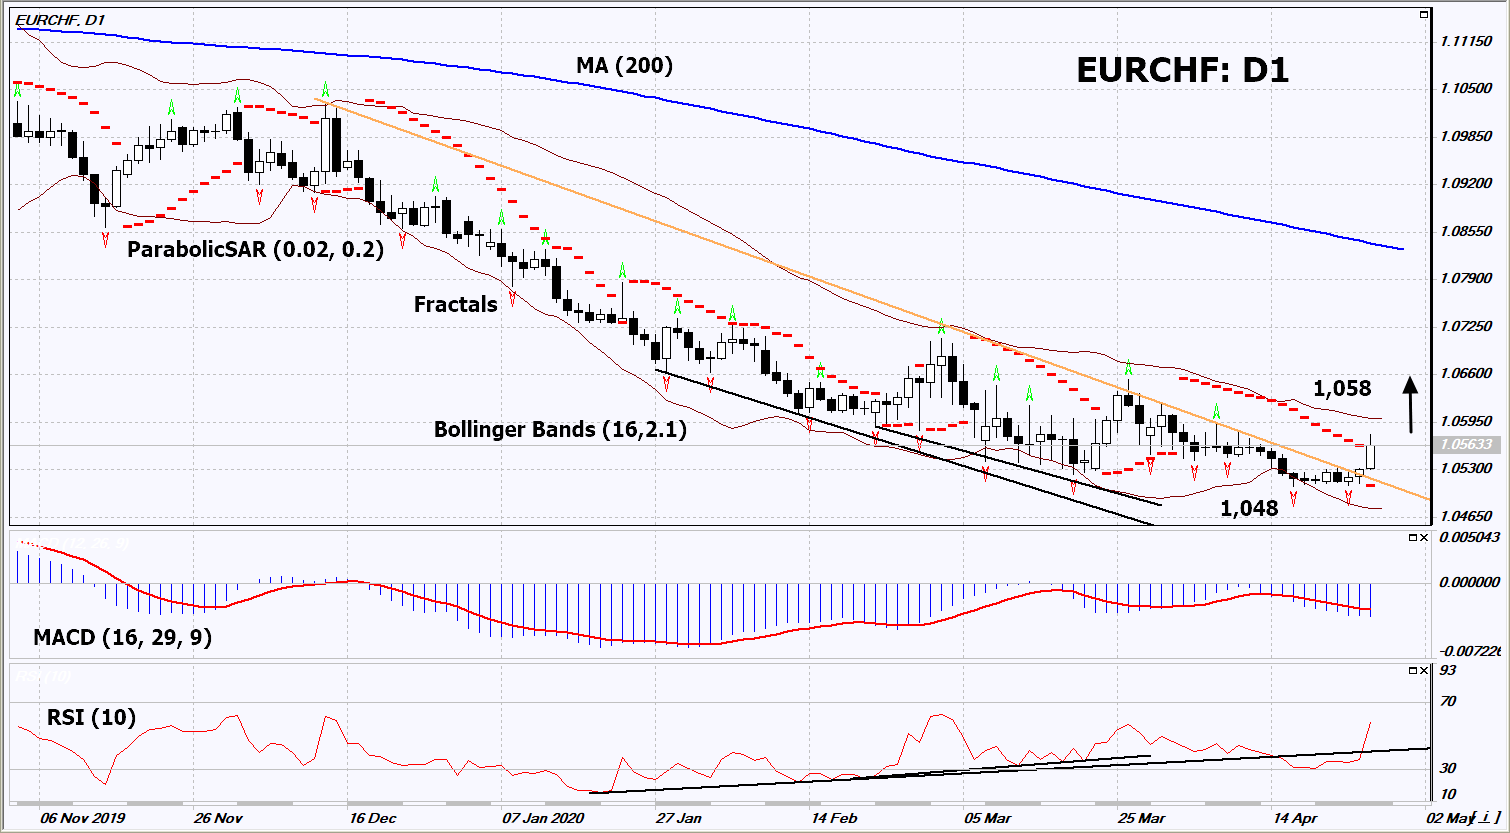 Technical Ysis Eurchf 2020 04 28